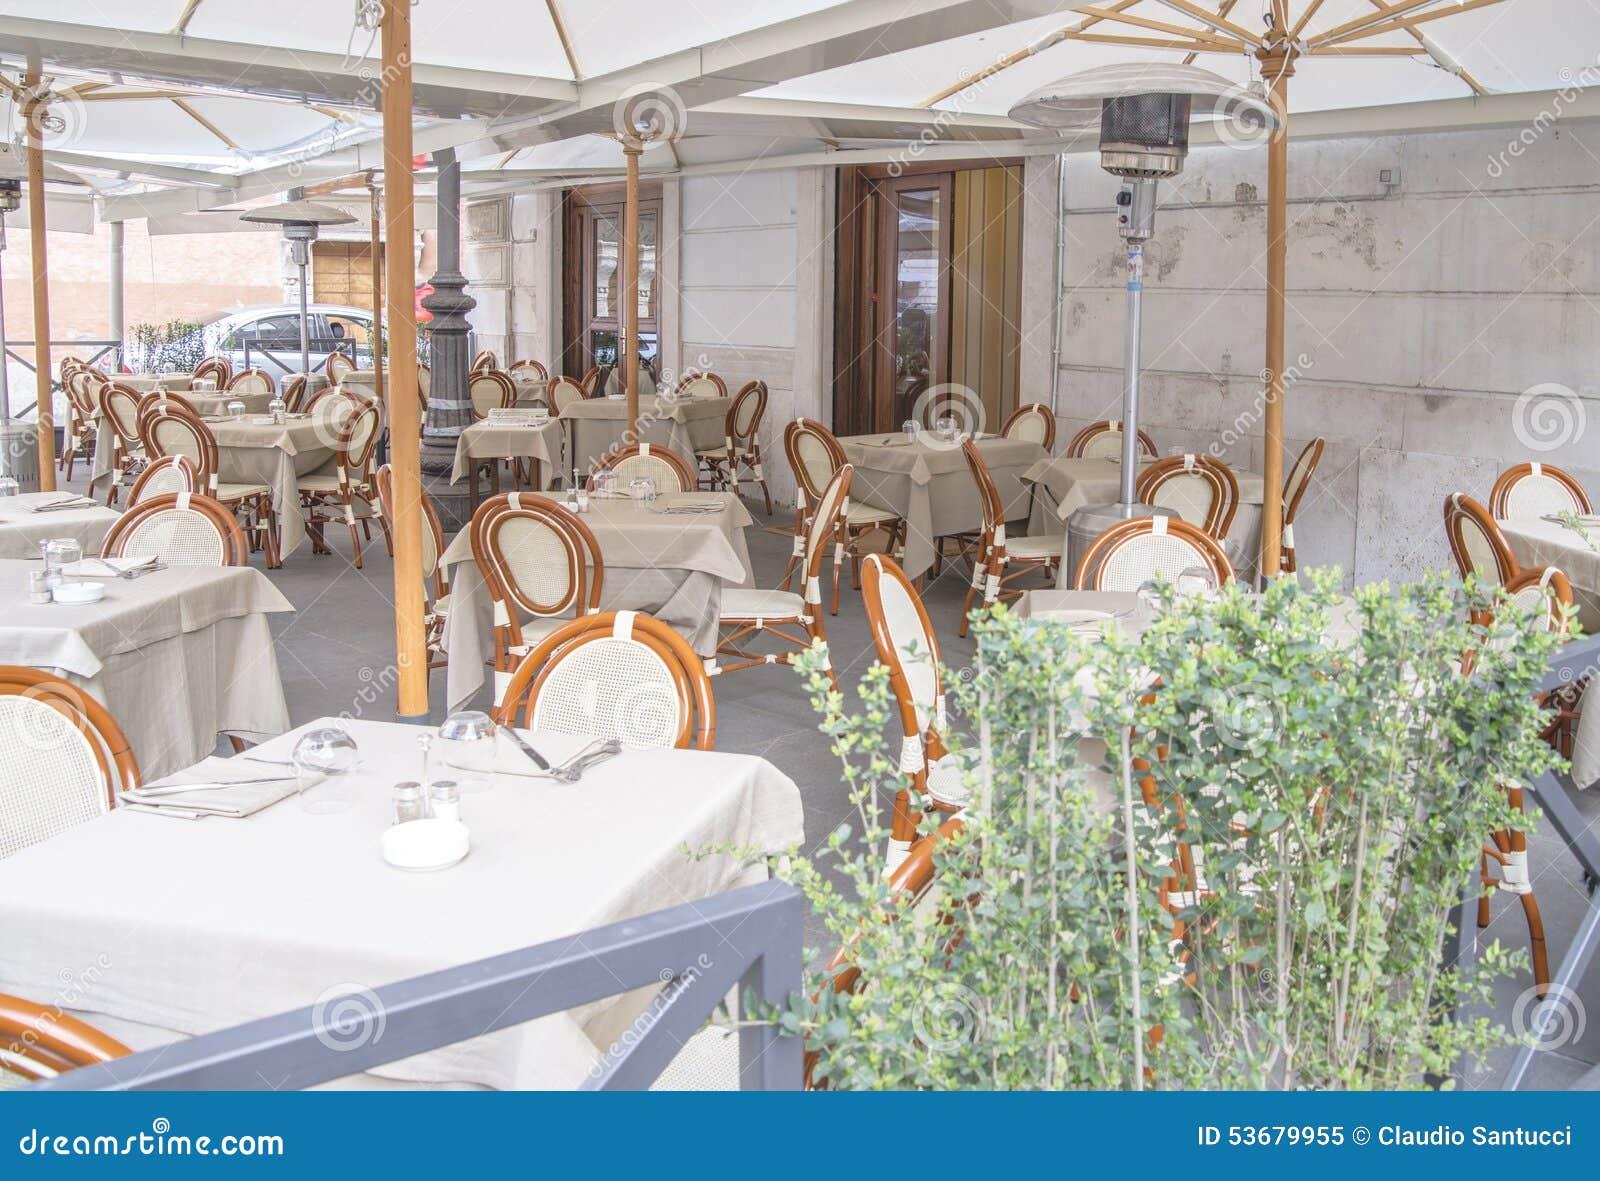 Italian restaurant exterior - Italian Restaurant Exterior